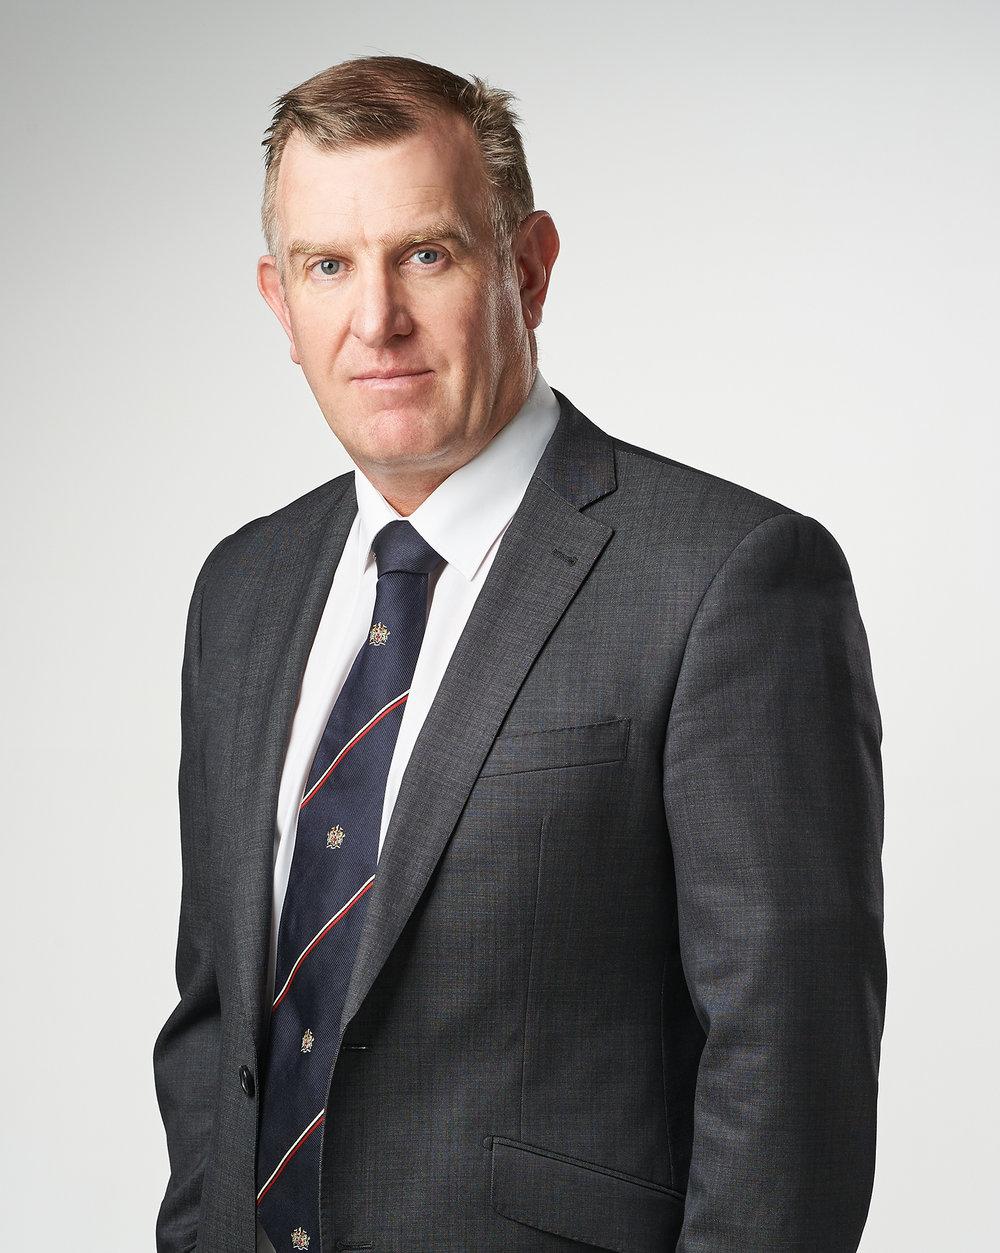 Dr Richard Fleming - MBBS, FRANZCO